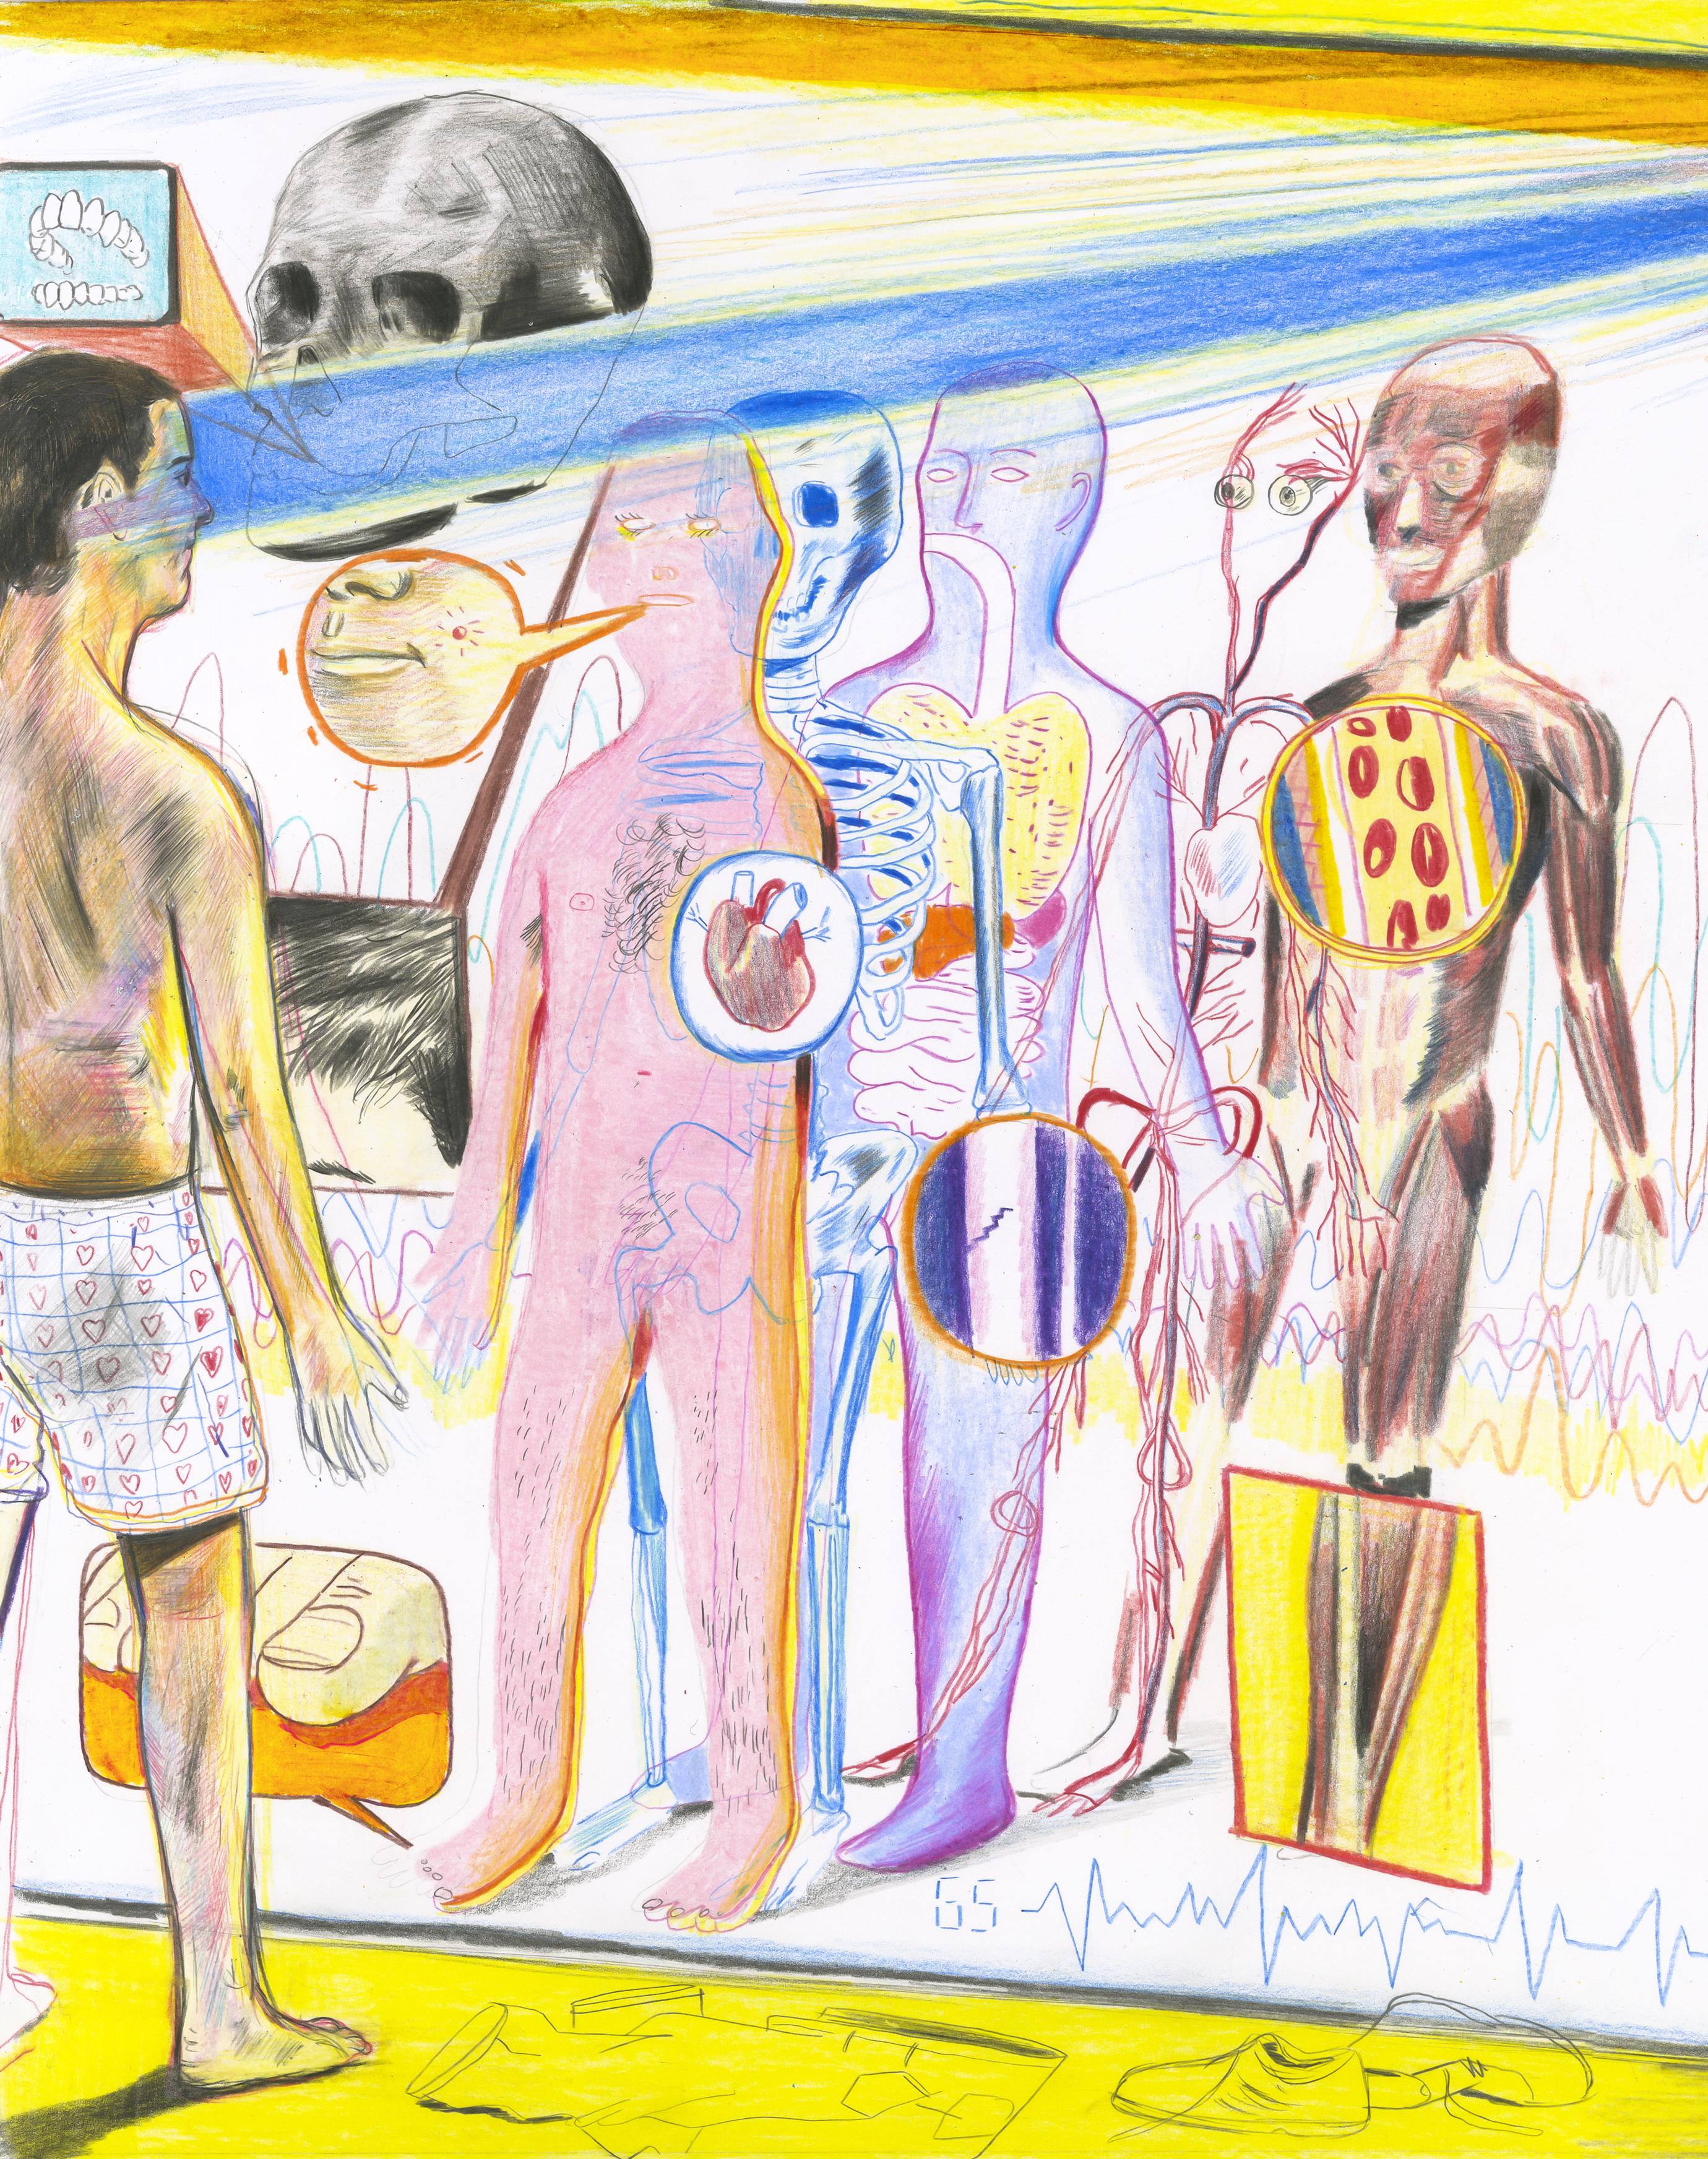 "<b> <a href=""https://www.technologyreview.com/s/608987/how-ai-will-keep-you-healthy/""> ¿Puedo mantenerlo saludable? </a> </ b> Ilustración de Yann Kebbi"